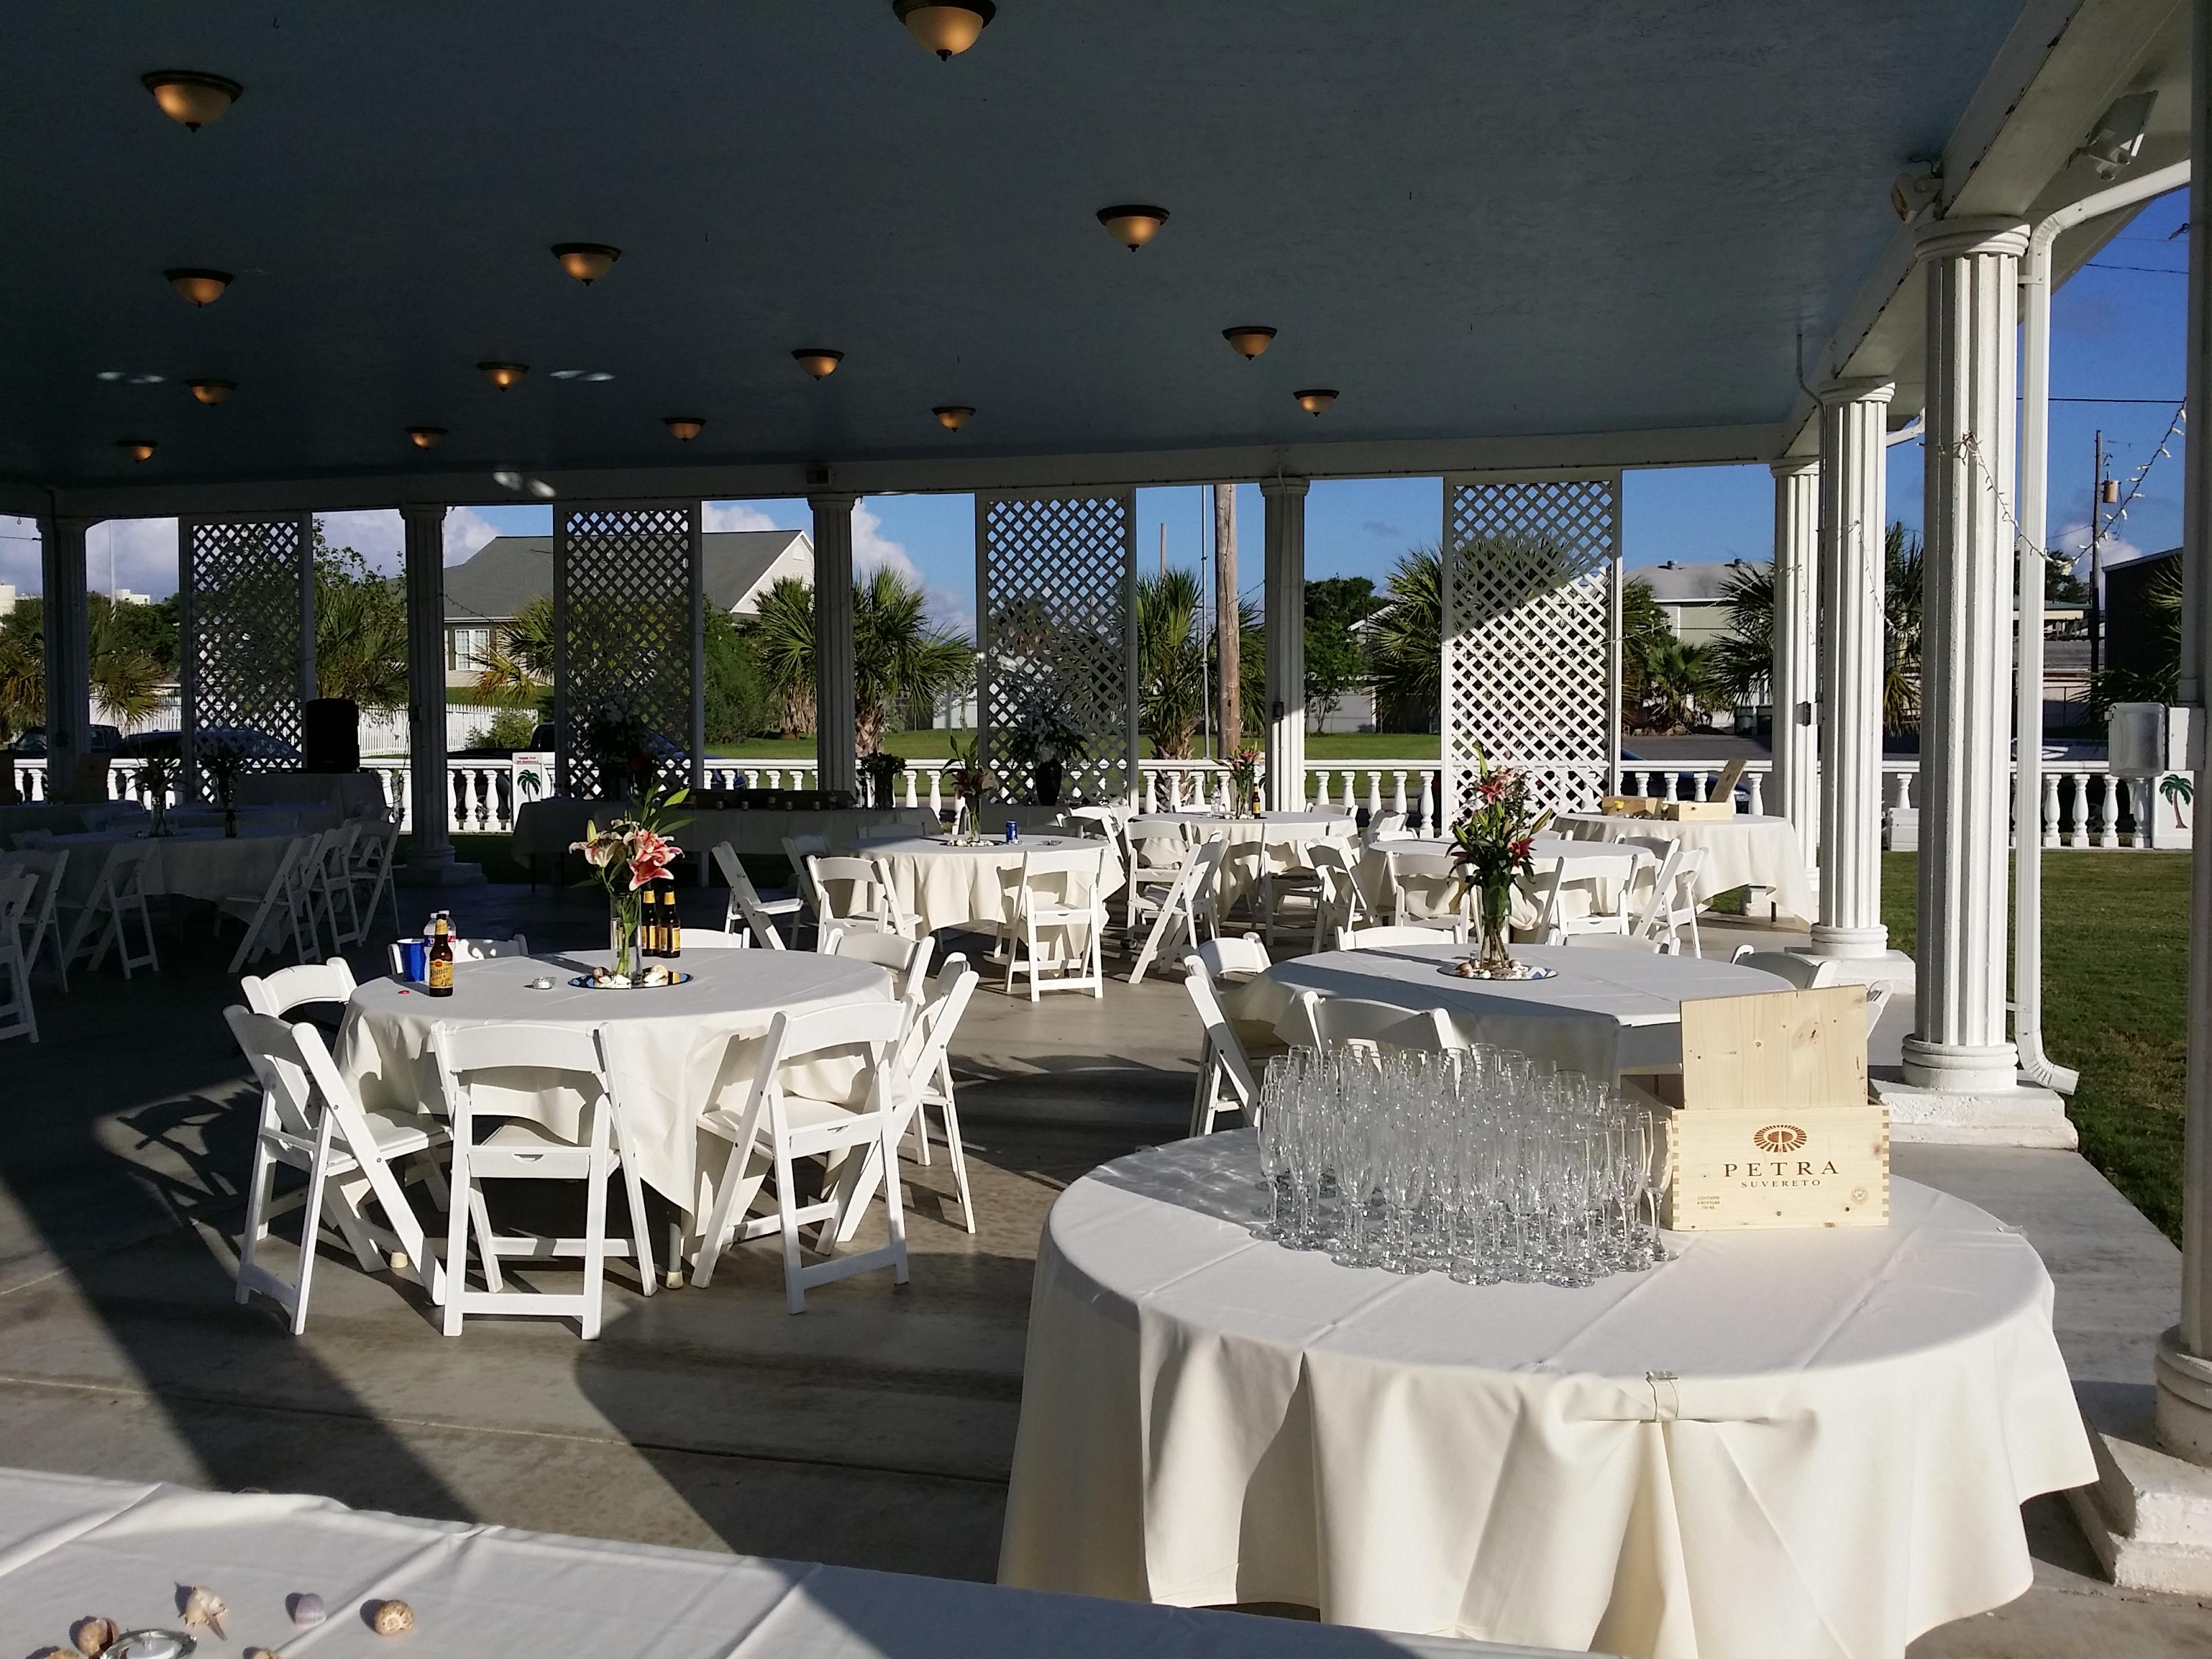 Outdoor Reception Venue Galveston Island Palms White Garden Chair Set Up